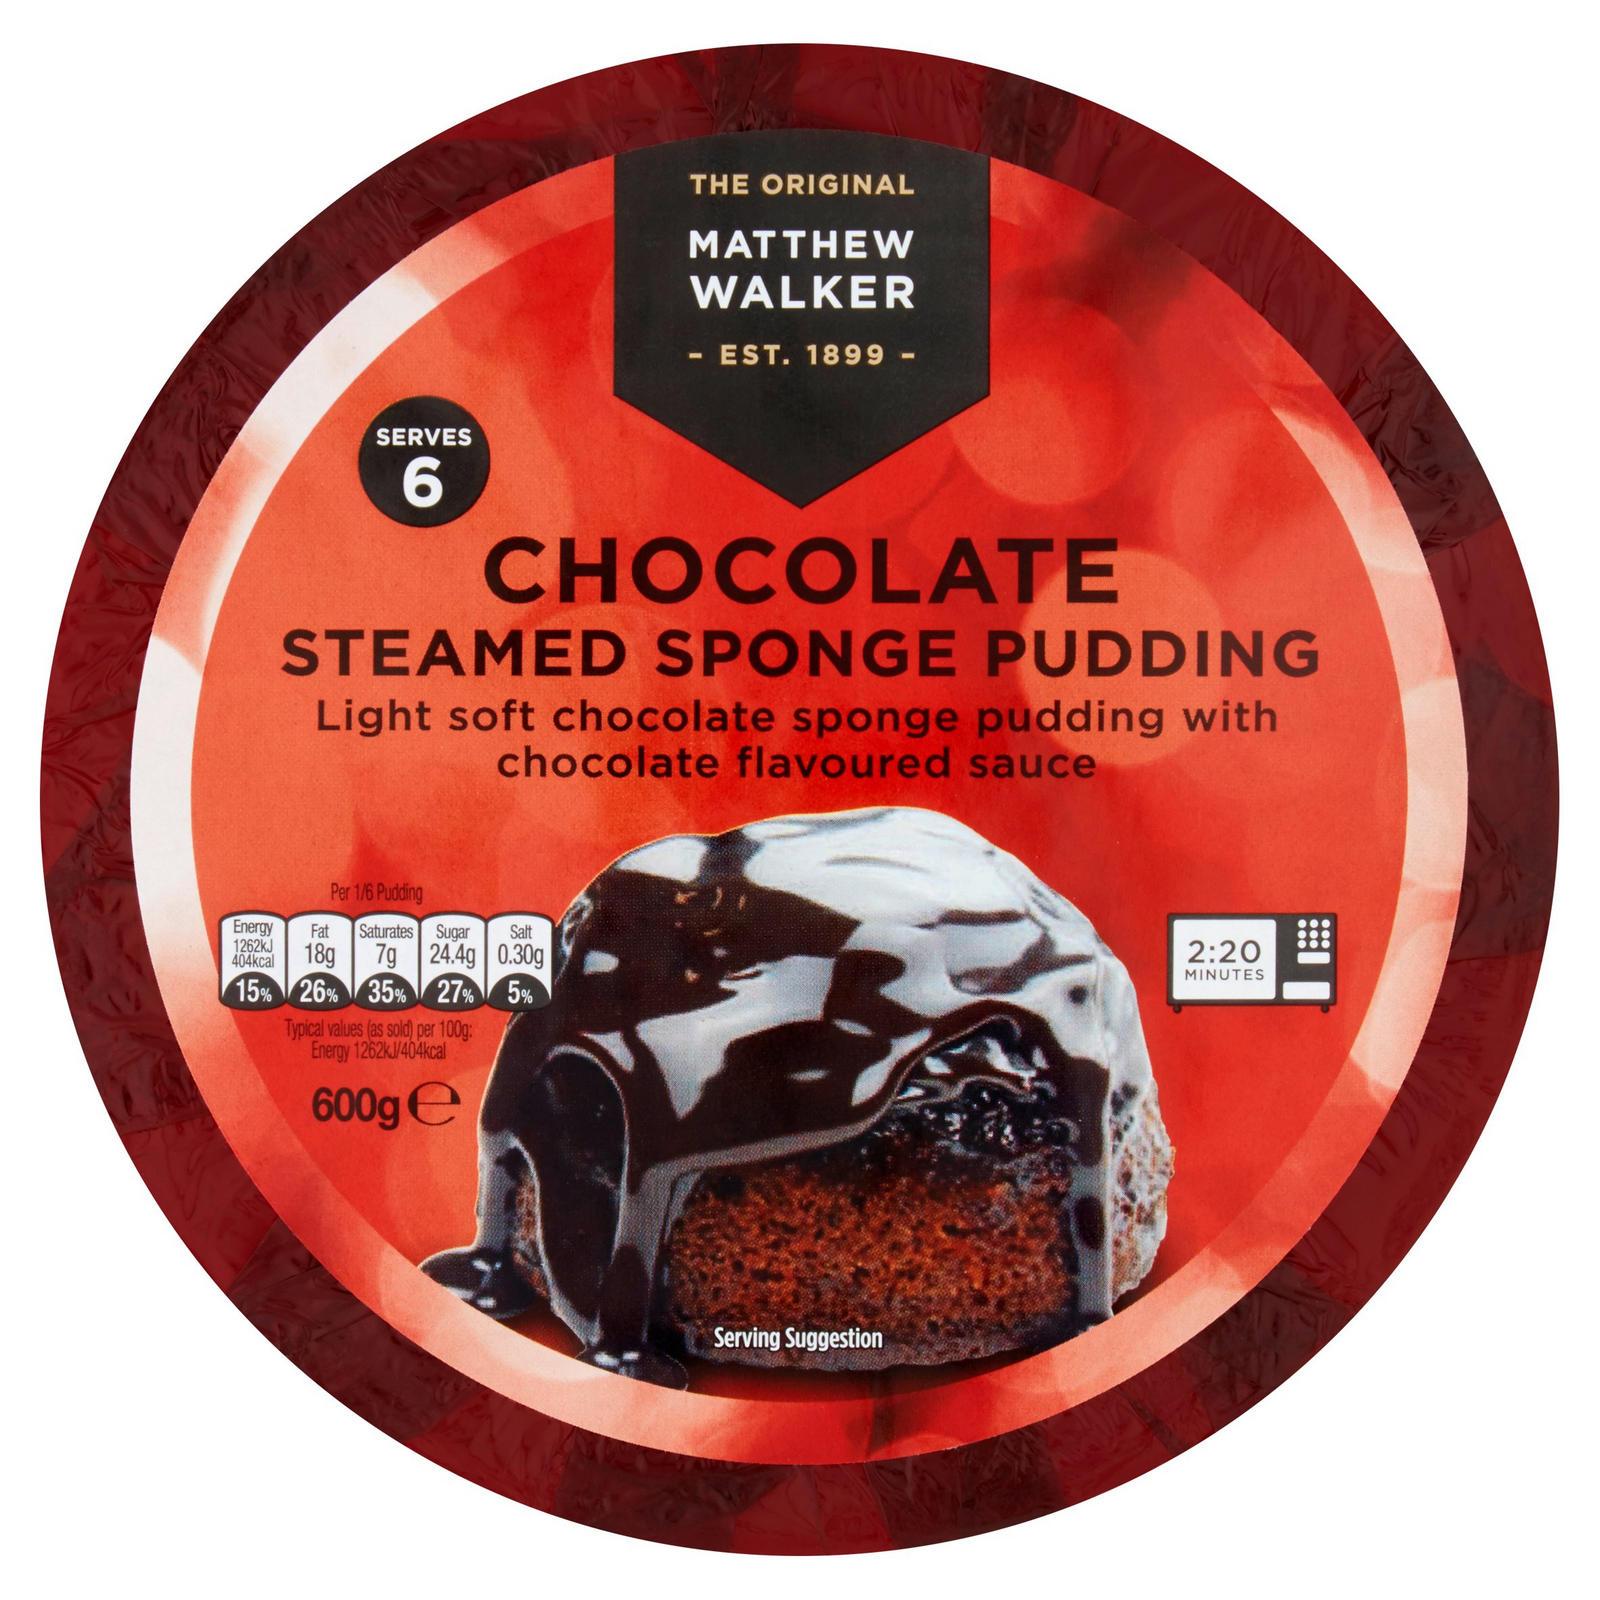 Matthew Walker Chocolate Steamed Sponge Pudding 600g Cakes